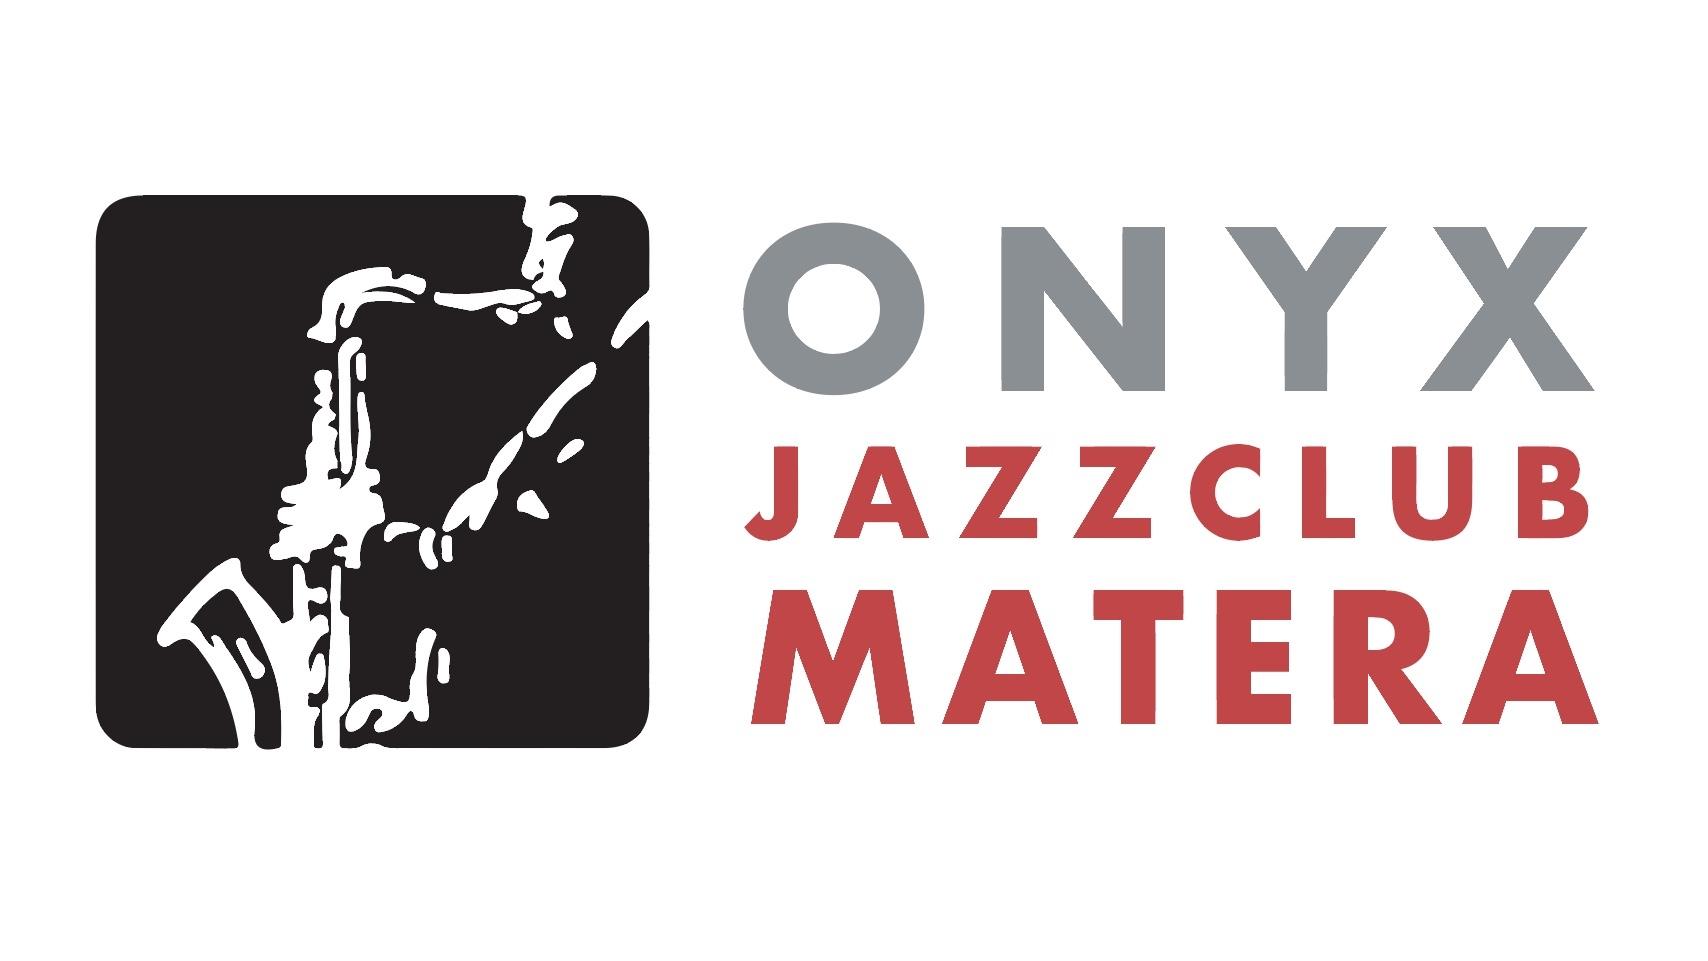 Onyx Jazz Club Matera